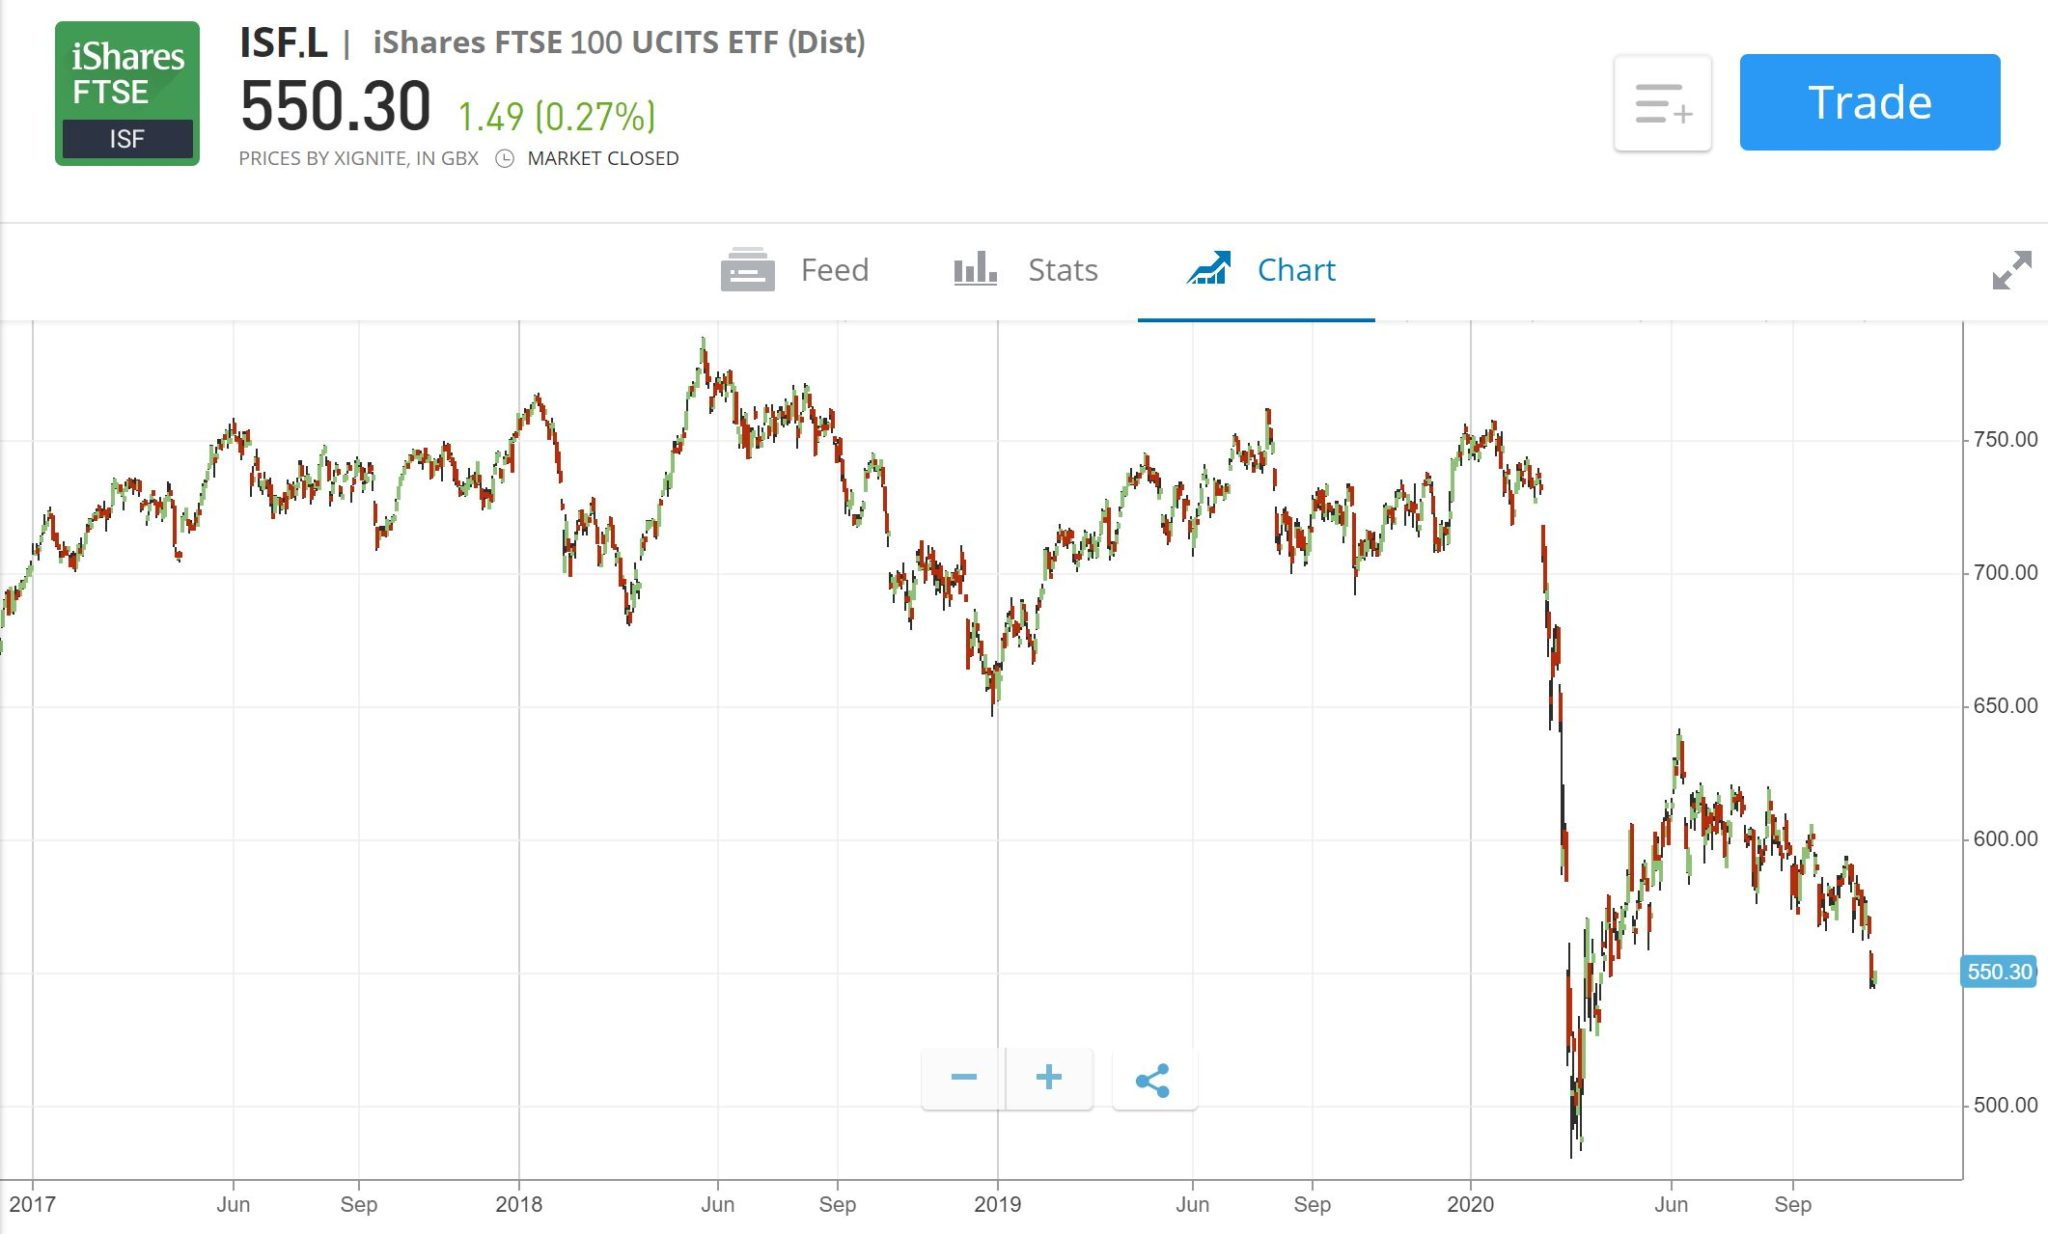 FTSE 100 ETF price chart